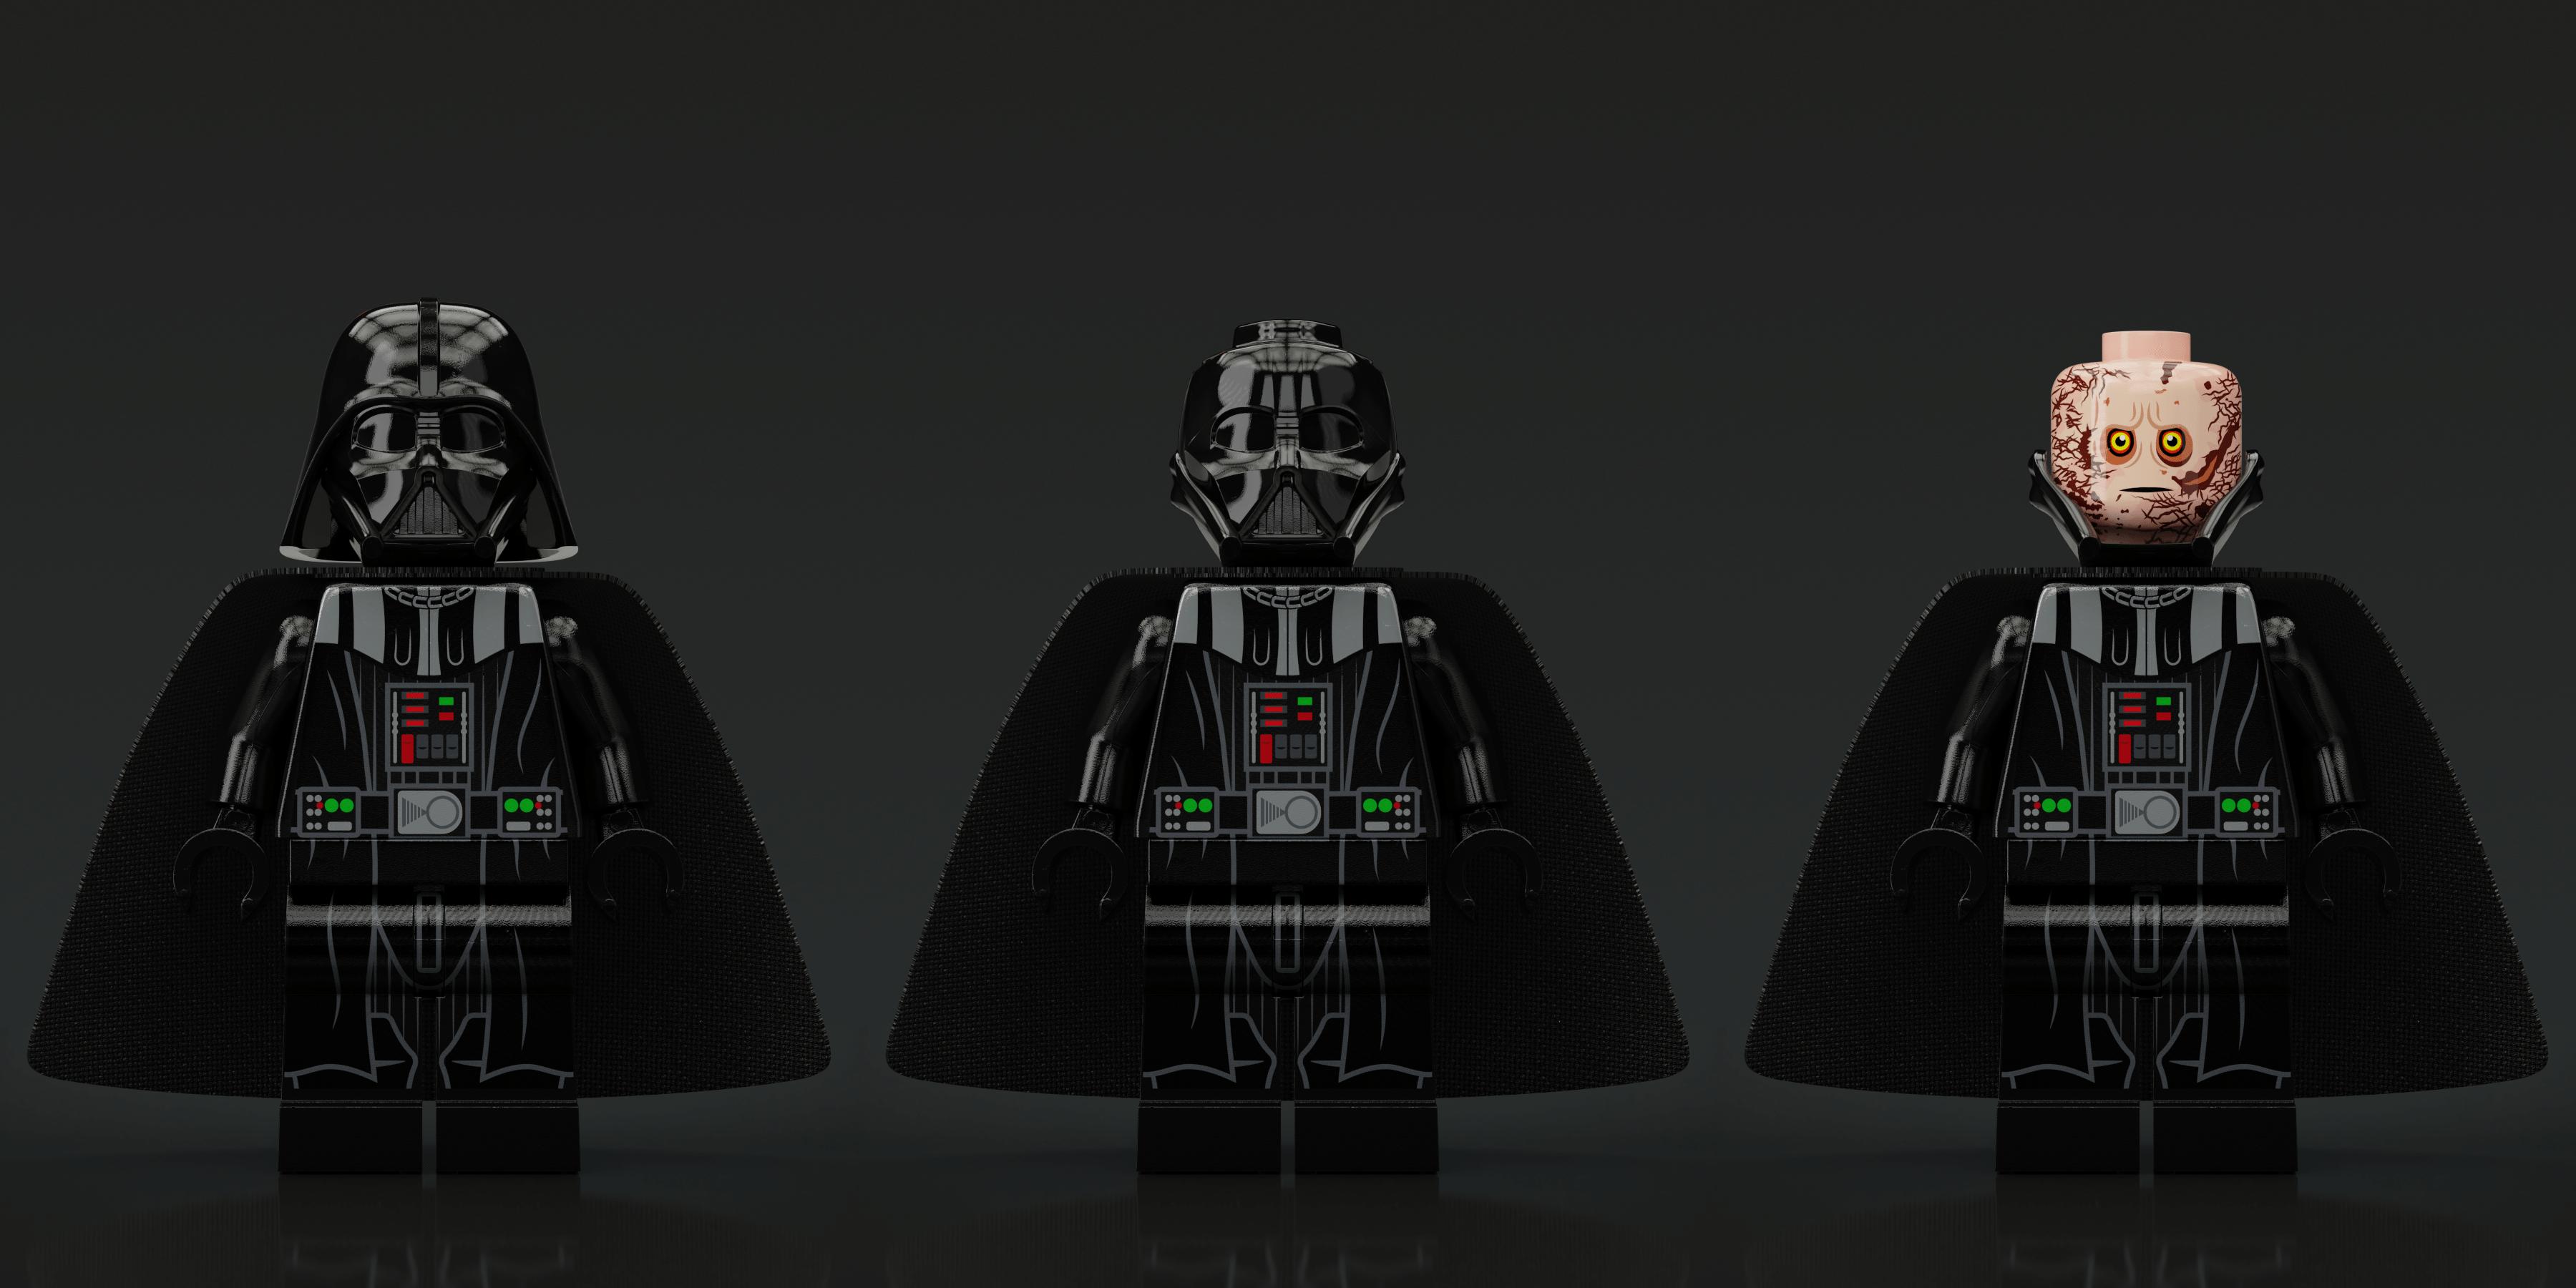 Lego Darth Vader Wallpapers Top Free Lego Darth Vader